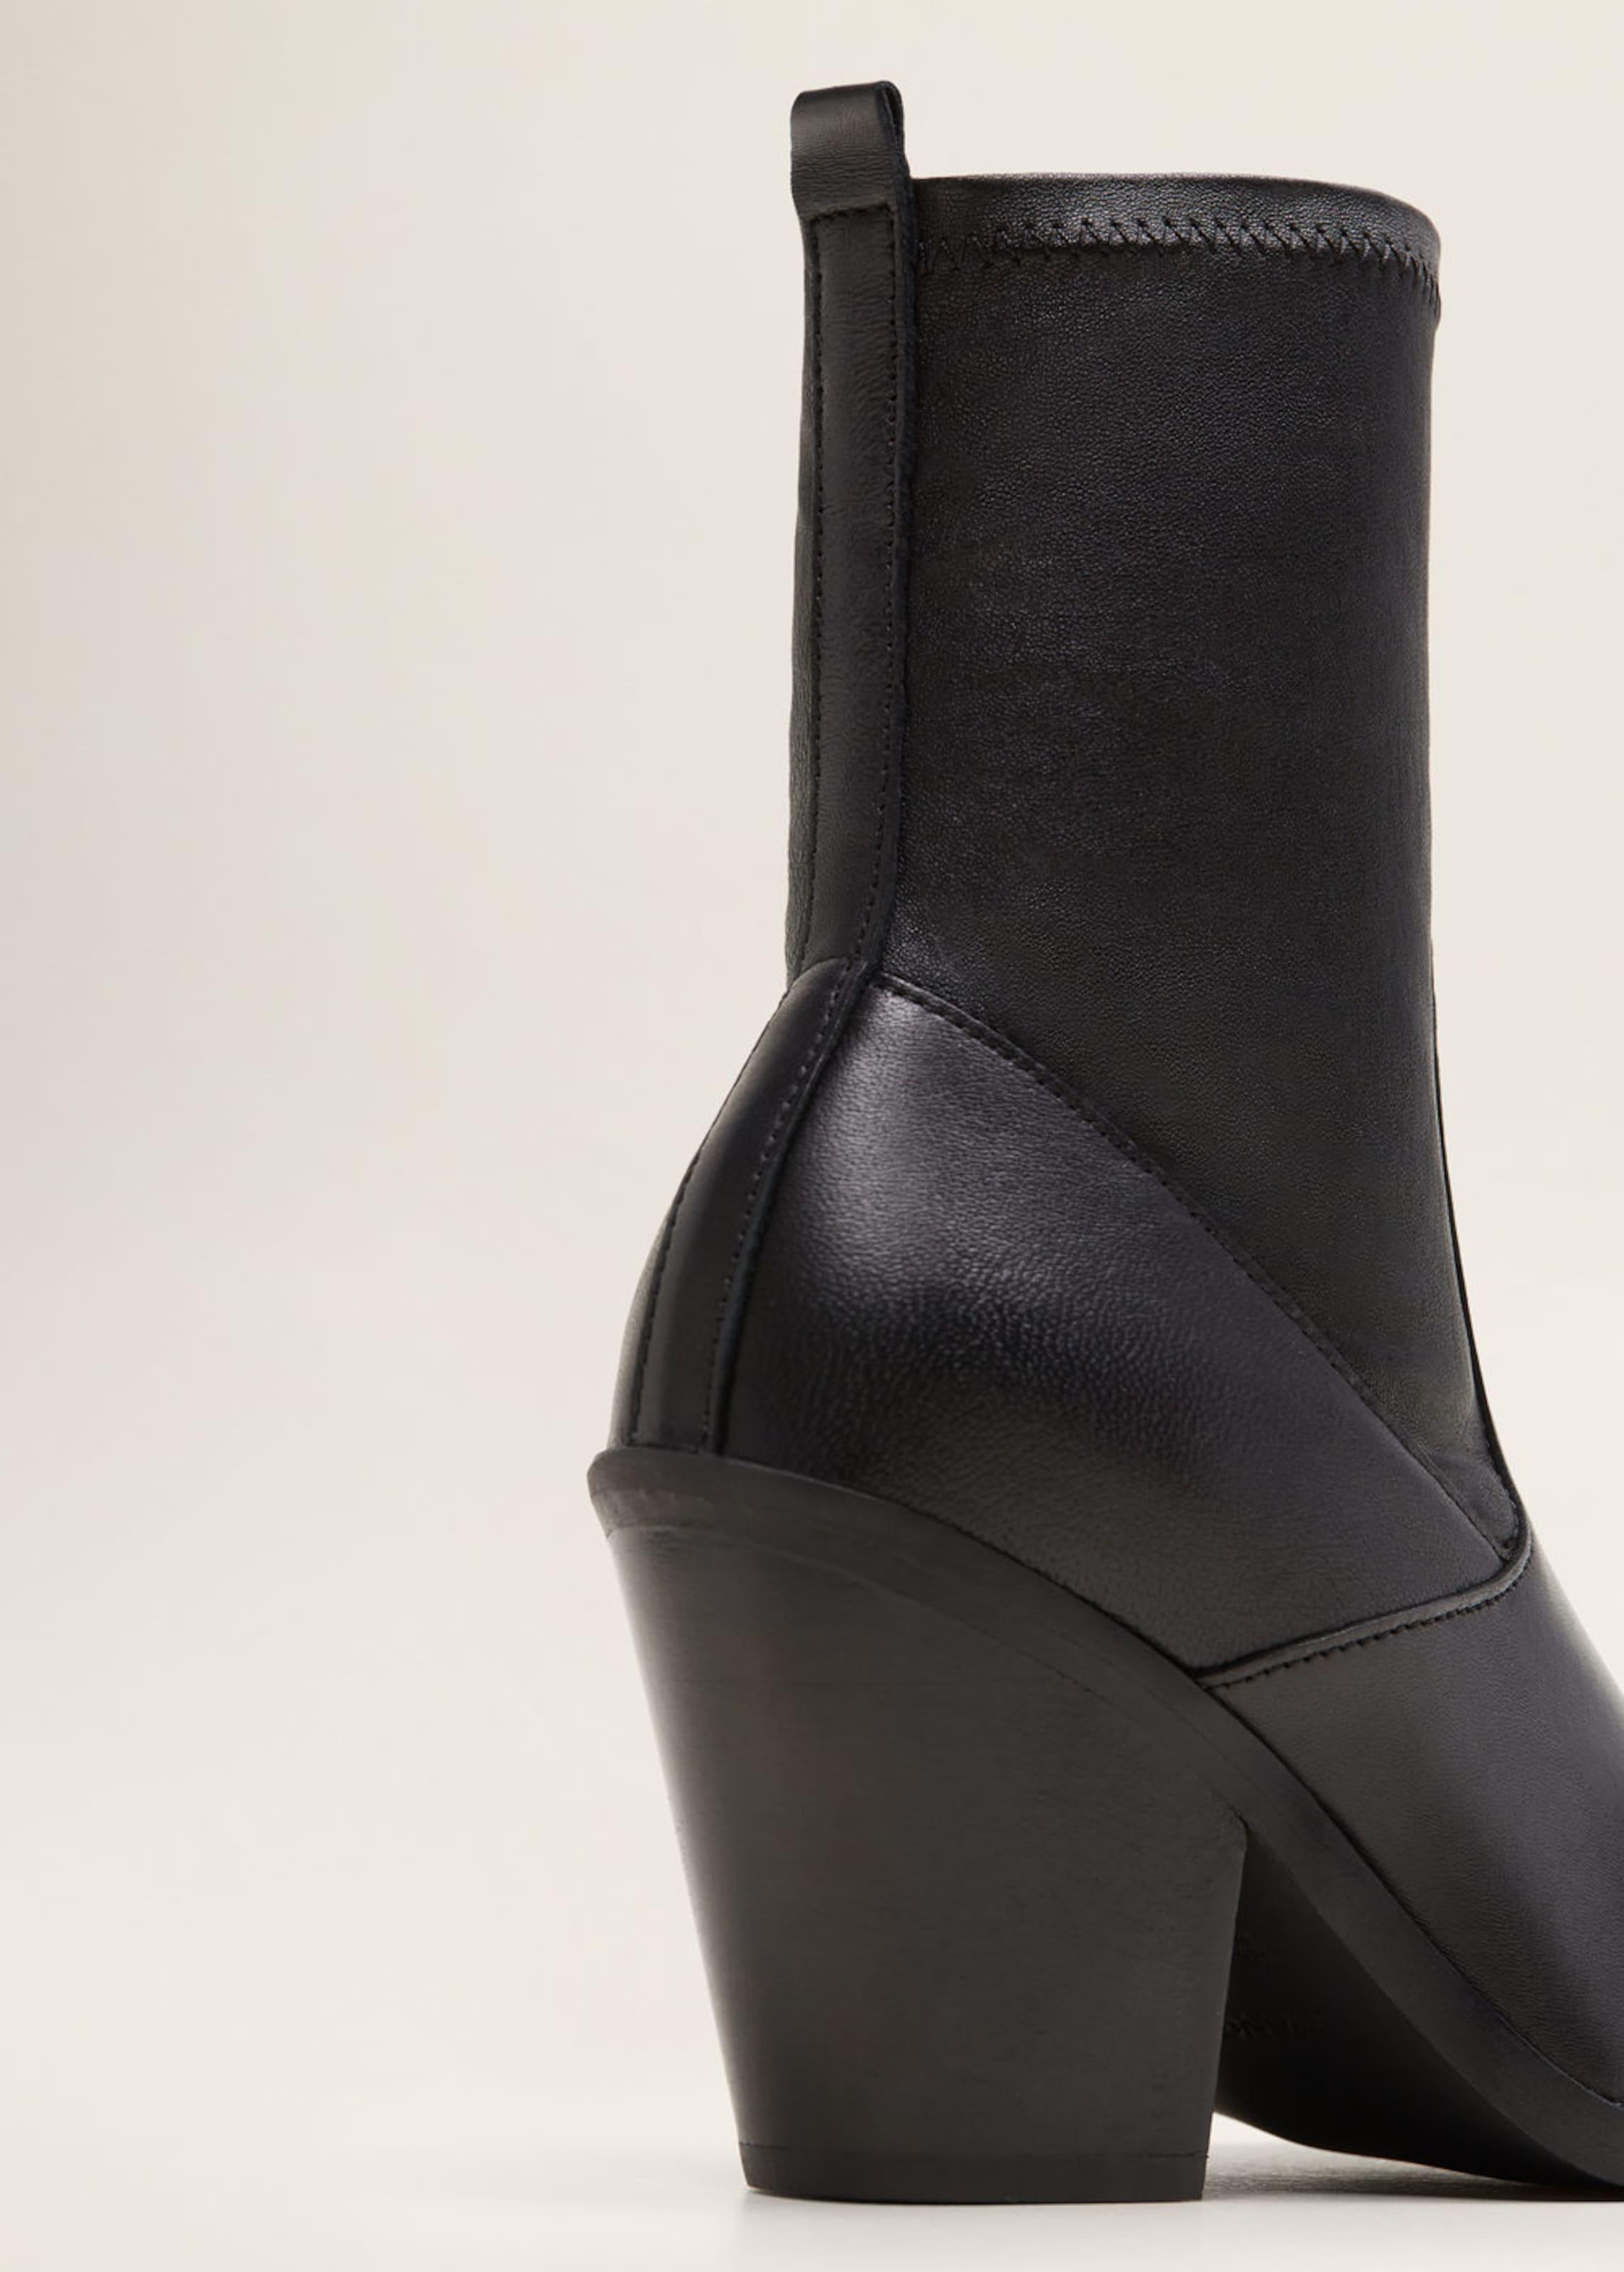 MANGO Halbstielfel 'Tierra Leder Leder Leder Billige Herren- und Damenschuhe 25ab9e